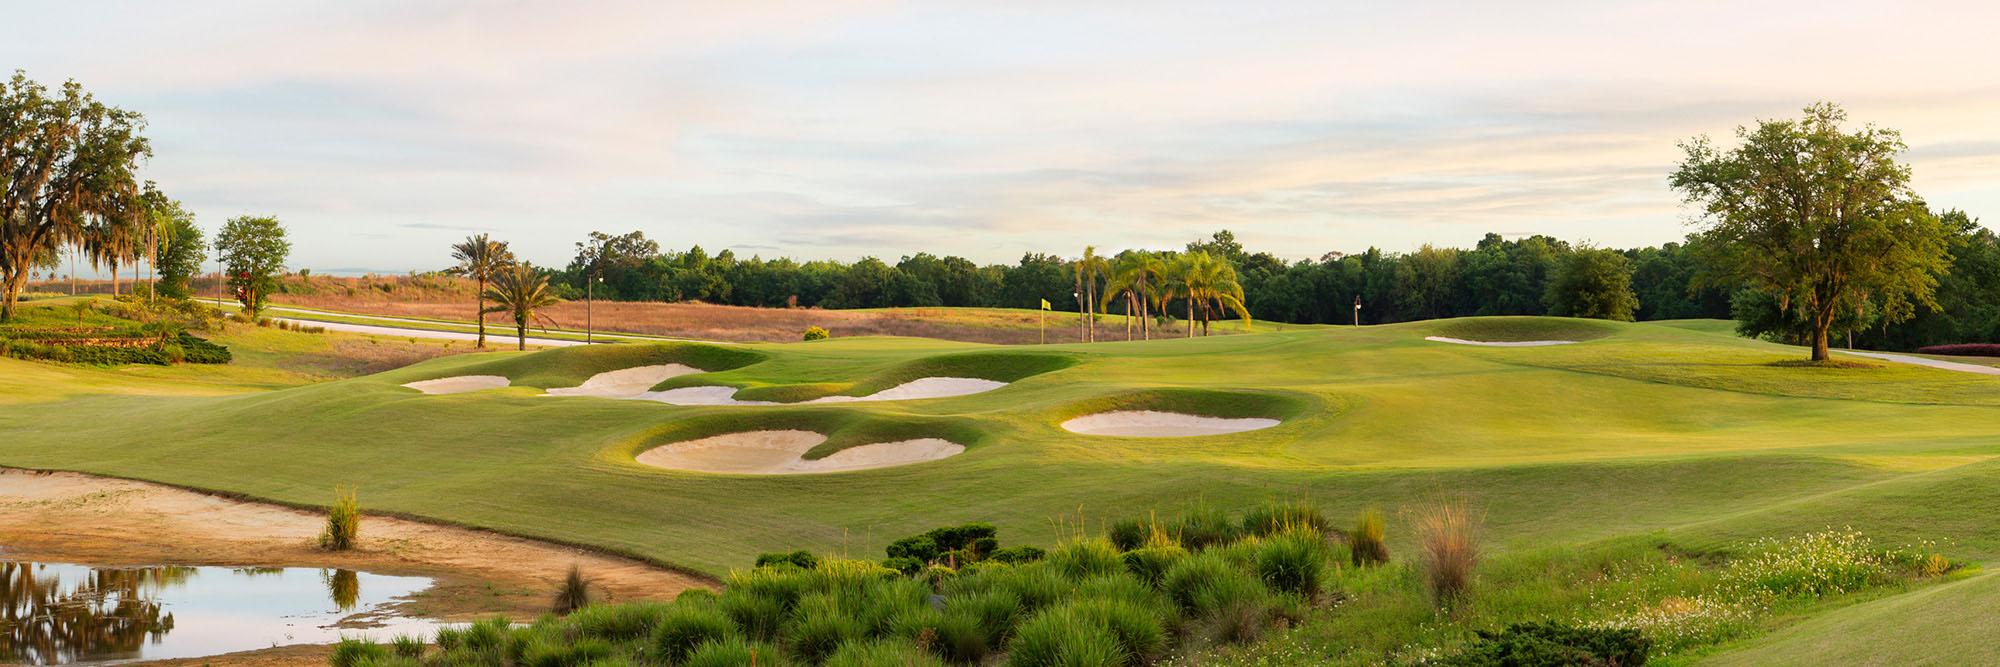 Golf Course Image - Reunion Resort Nicklaus No. 11